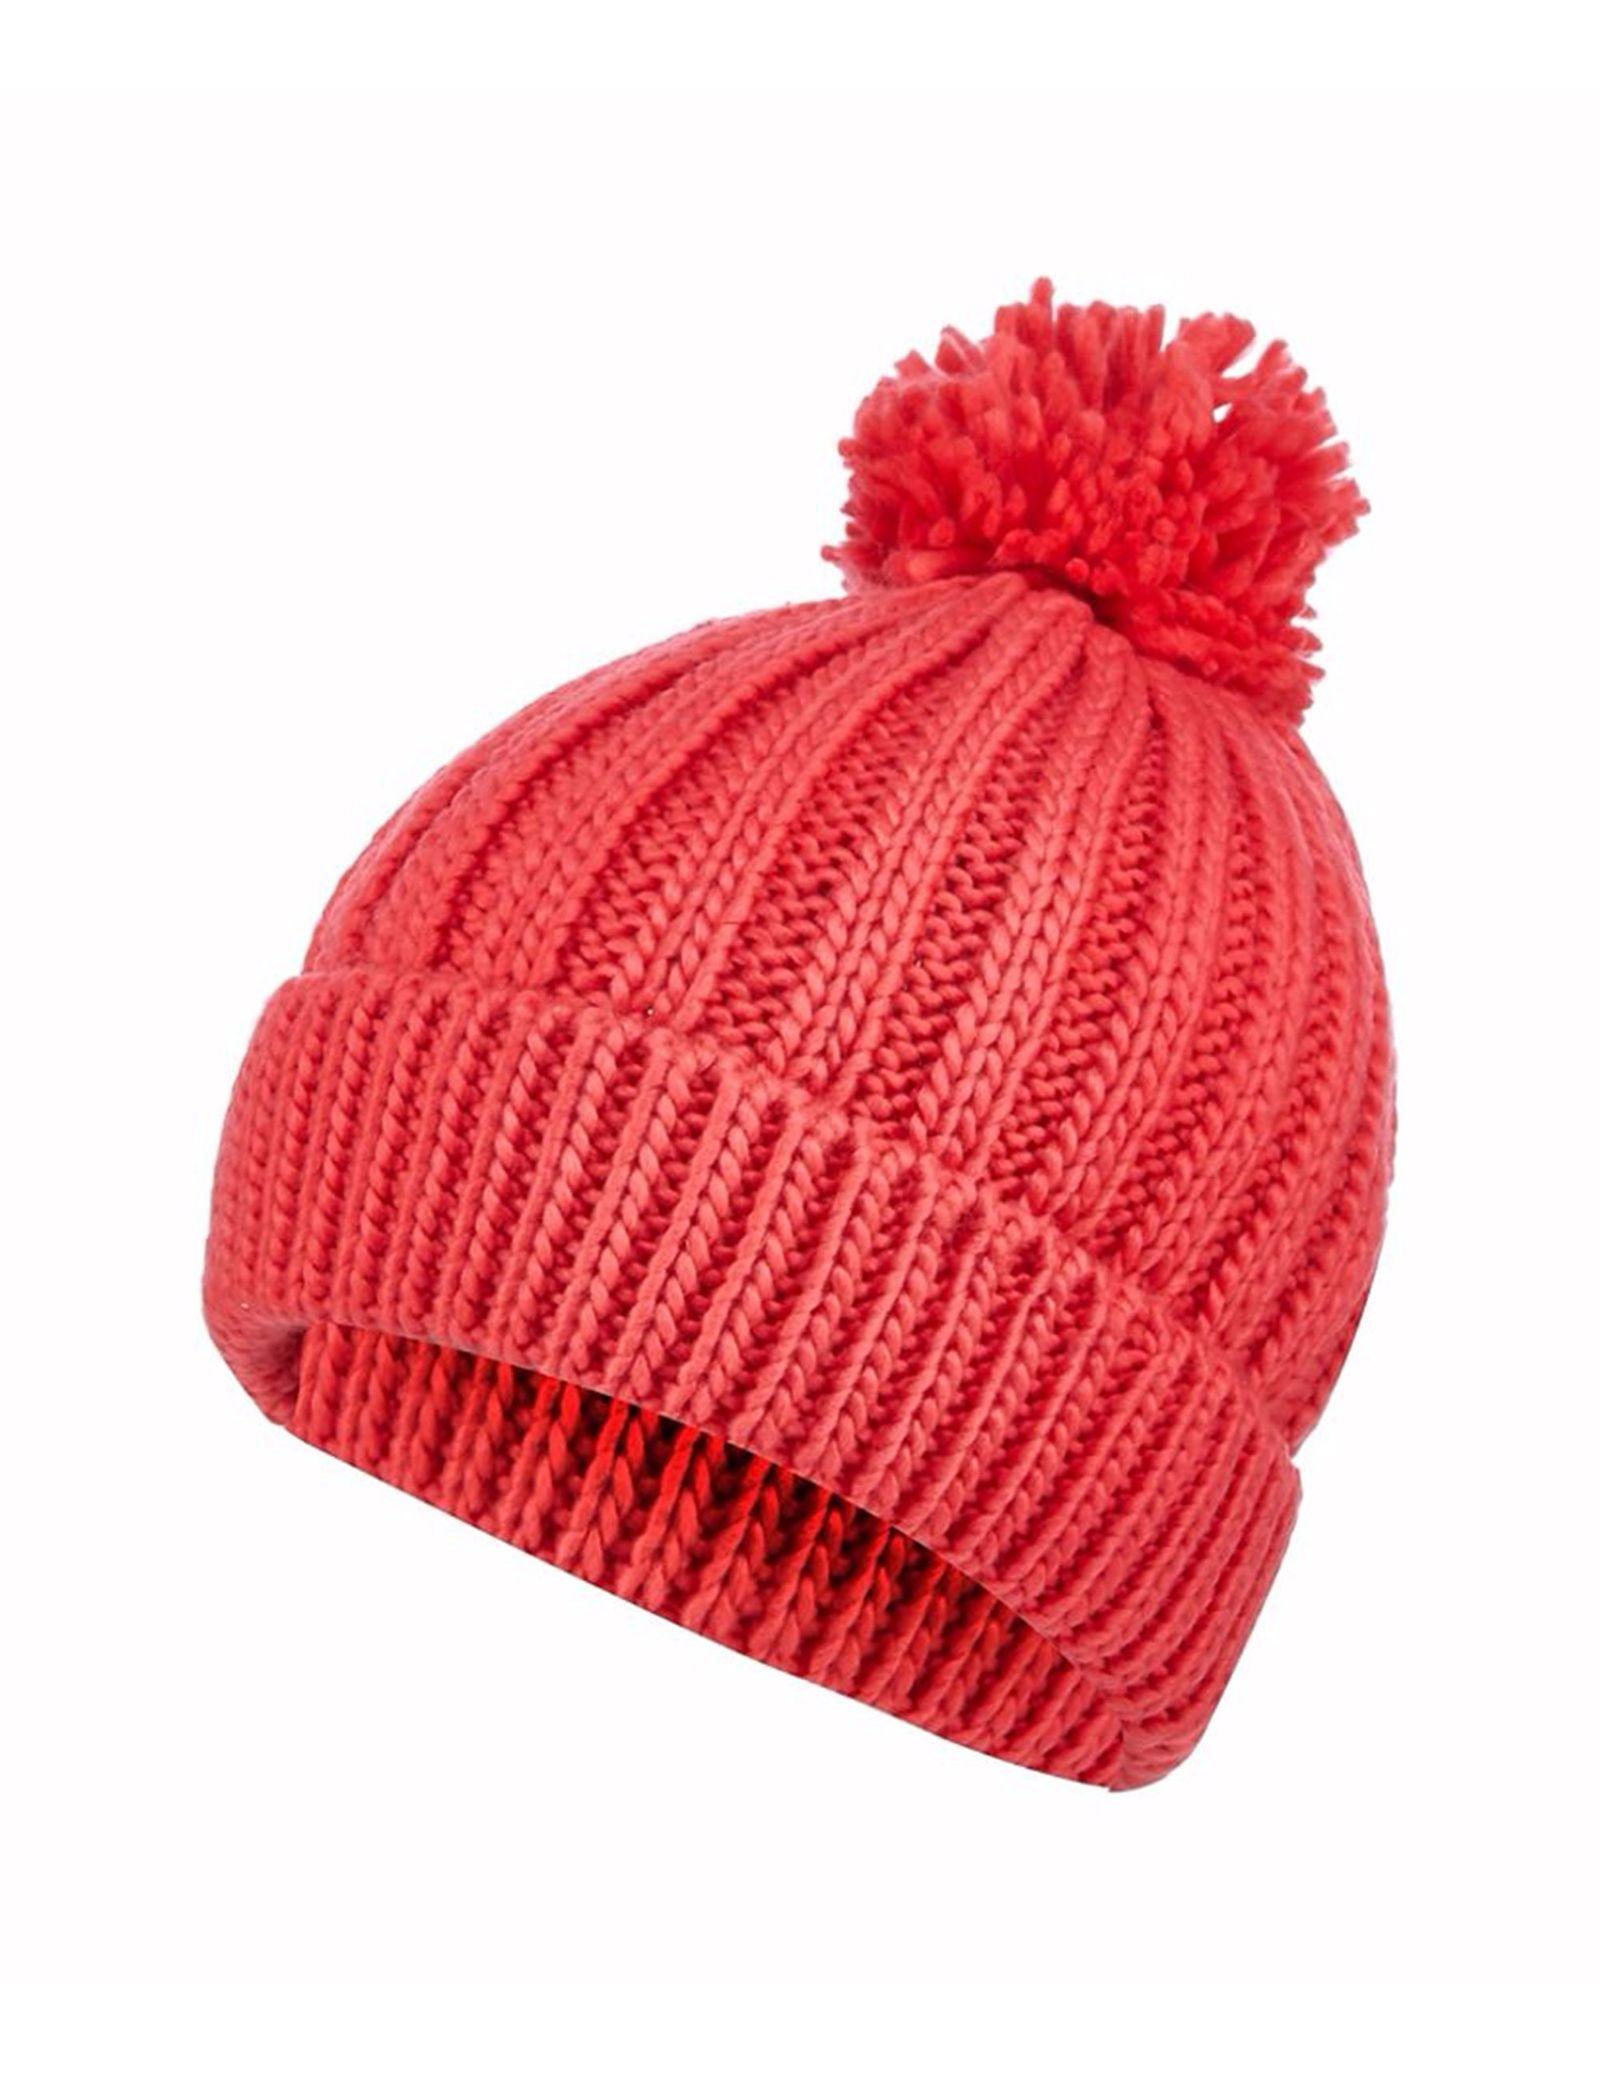 کلاه بافتنی زنانه - رد هرینگ - صورتي - 1